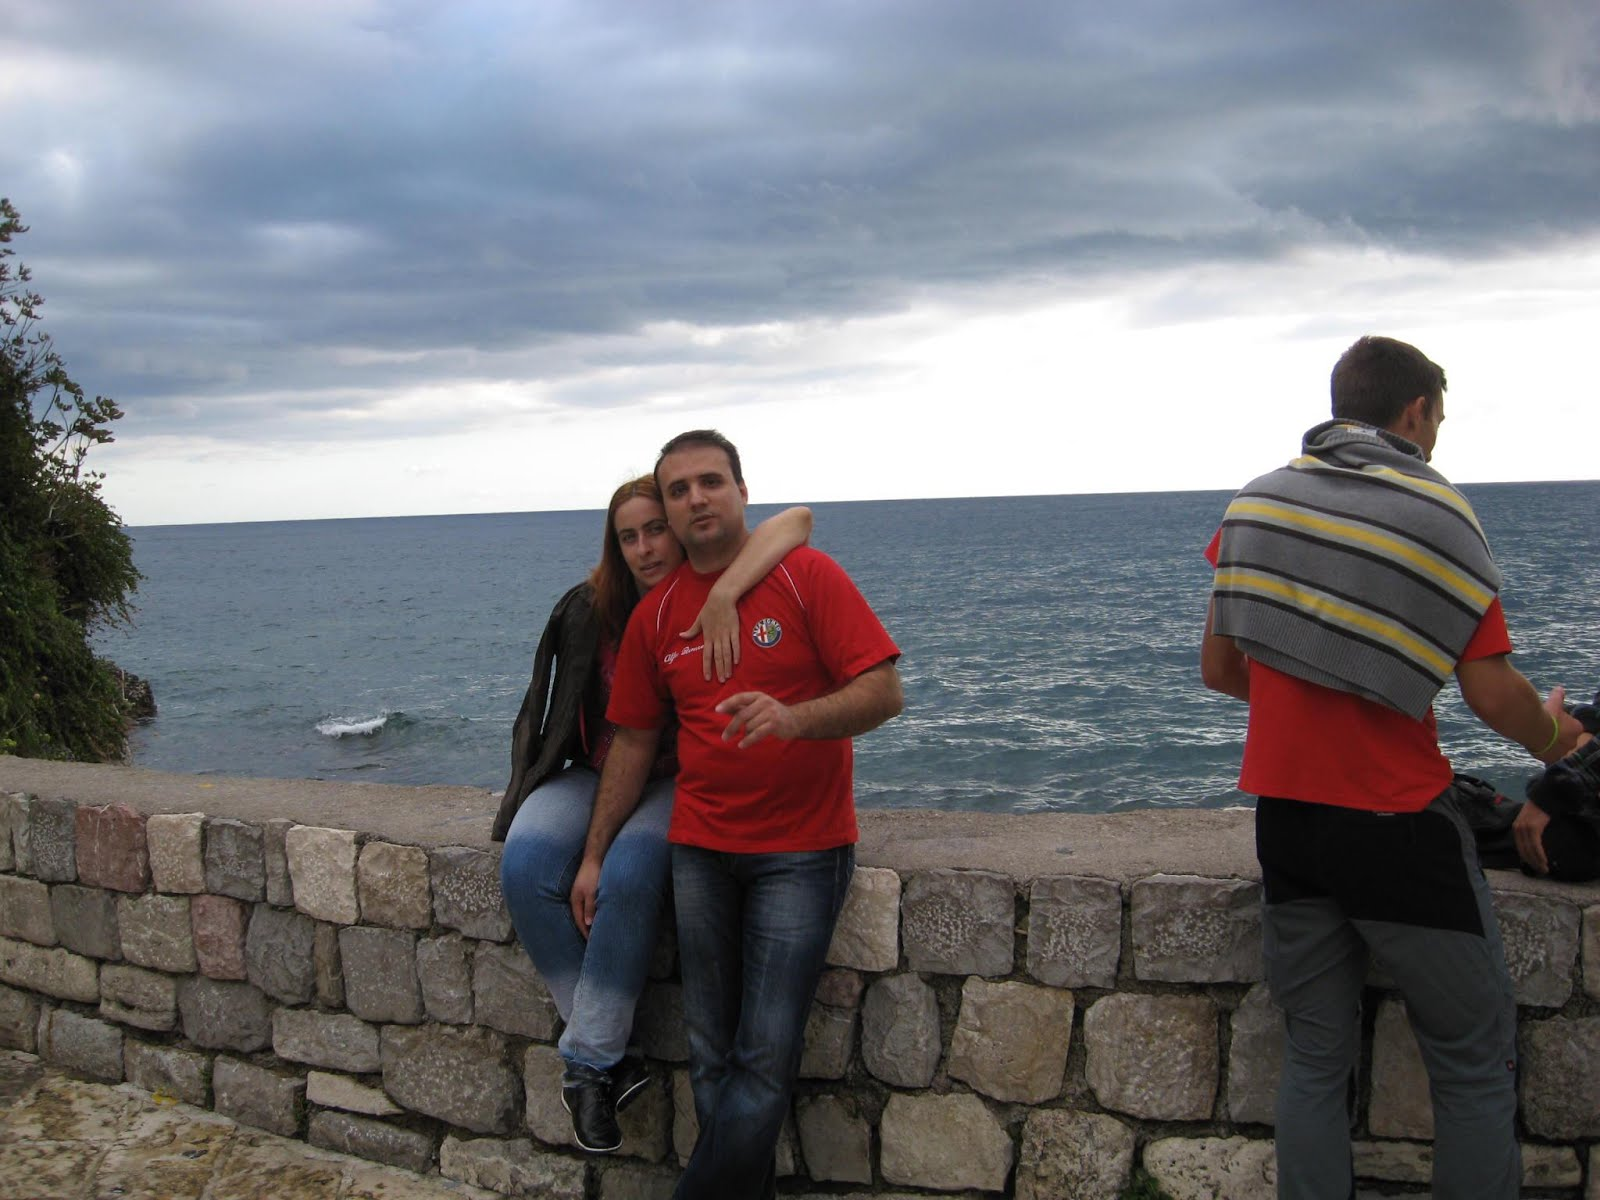 Ariel and Alex